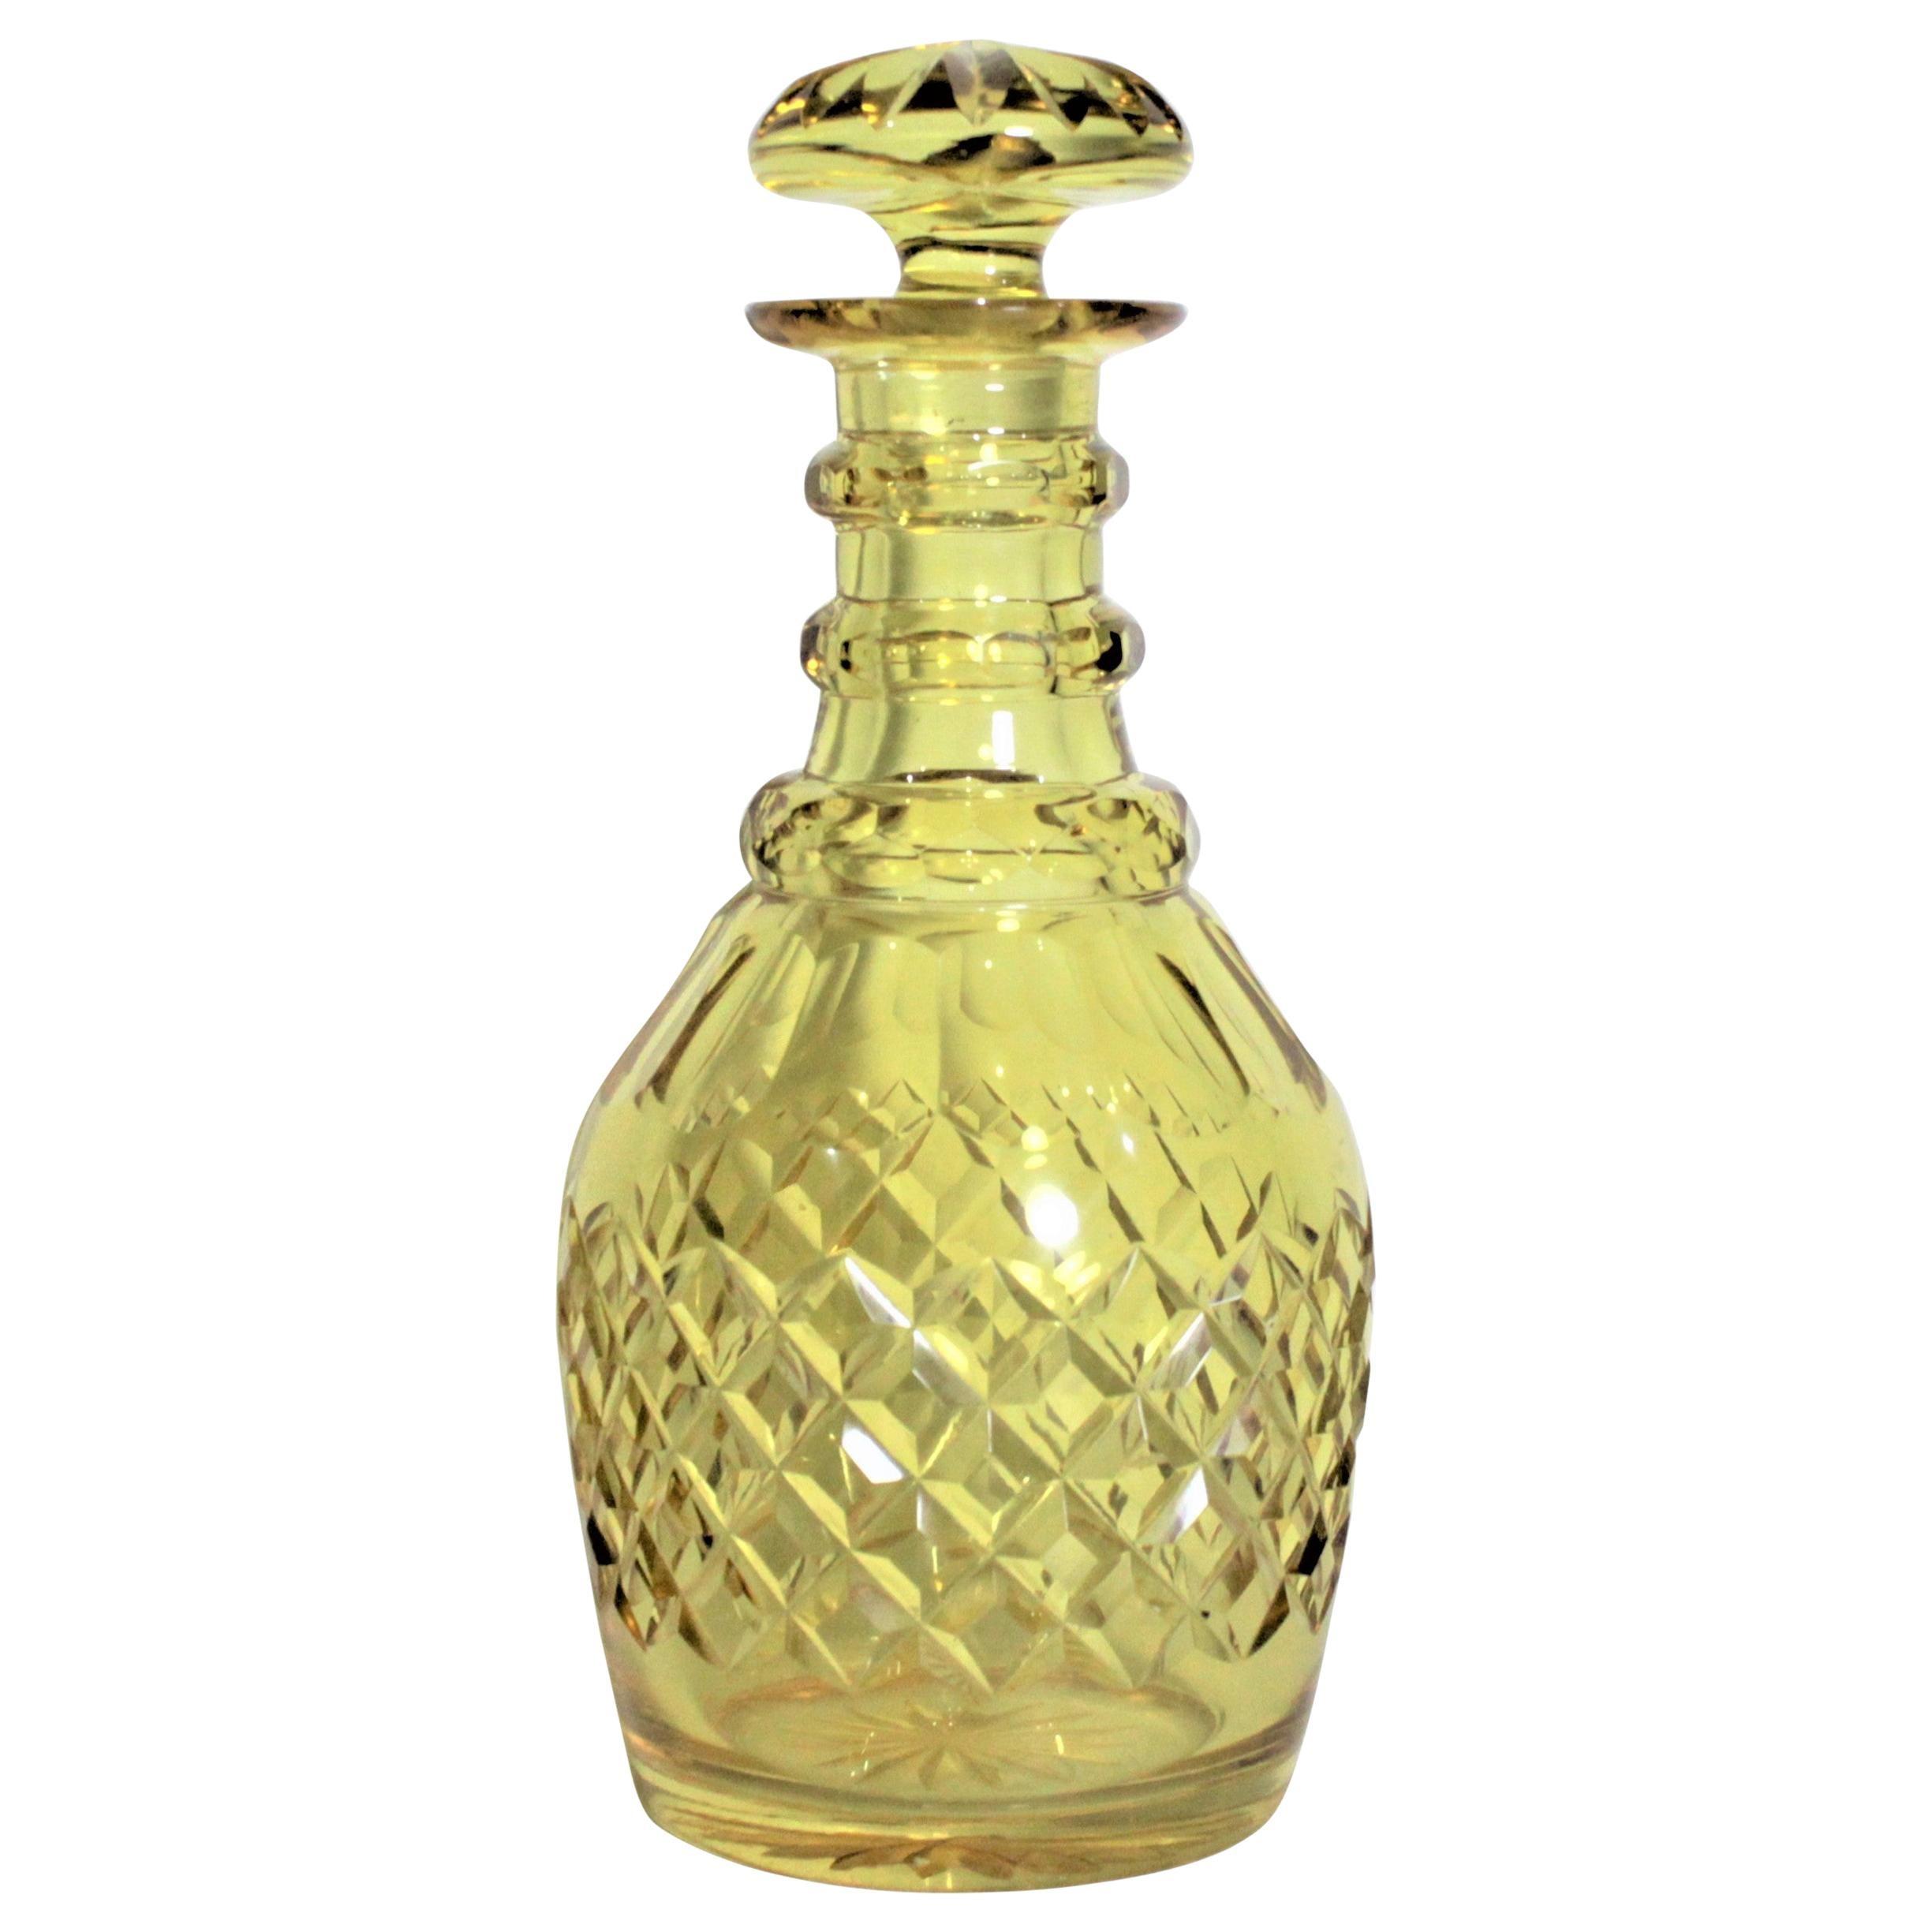 Antique Diamond Cut Crystal Yellow Glass Liquor Decanter or Bottle